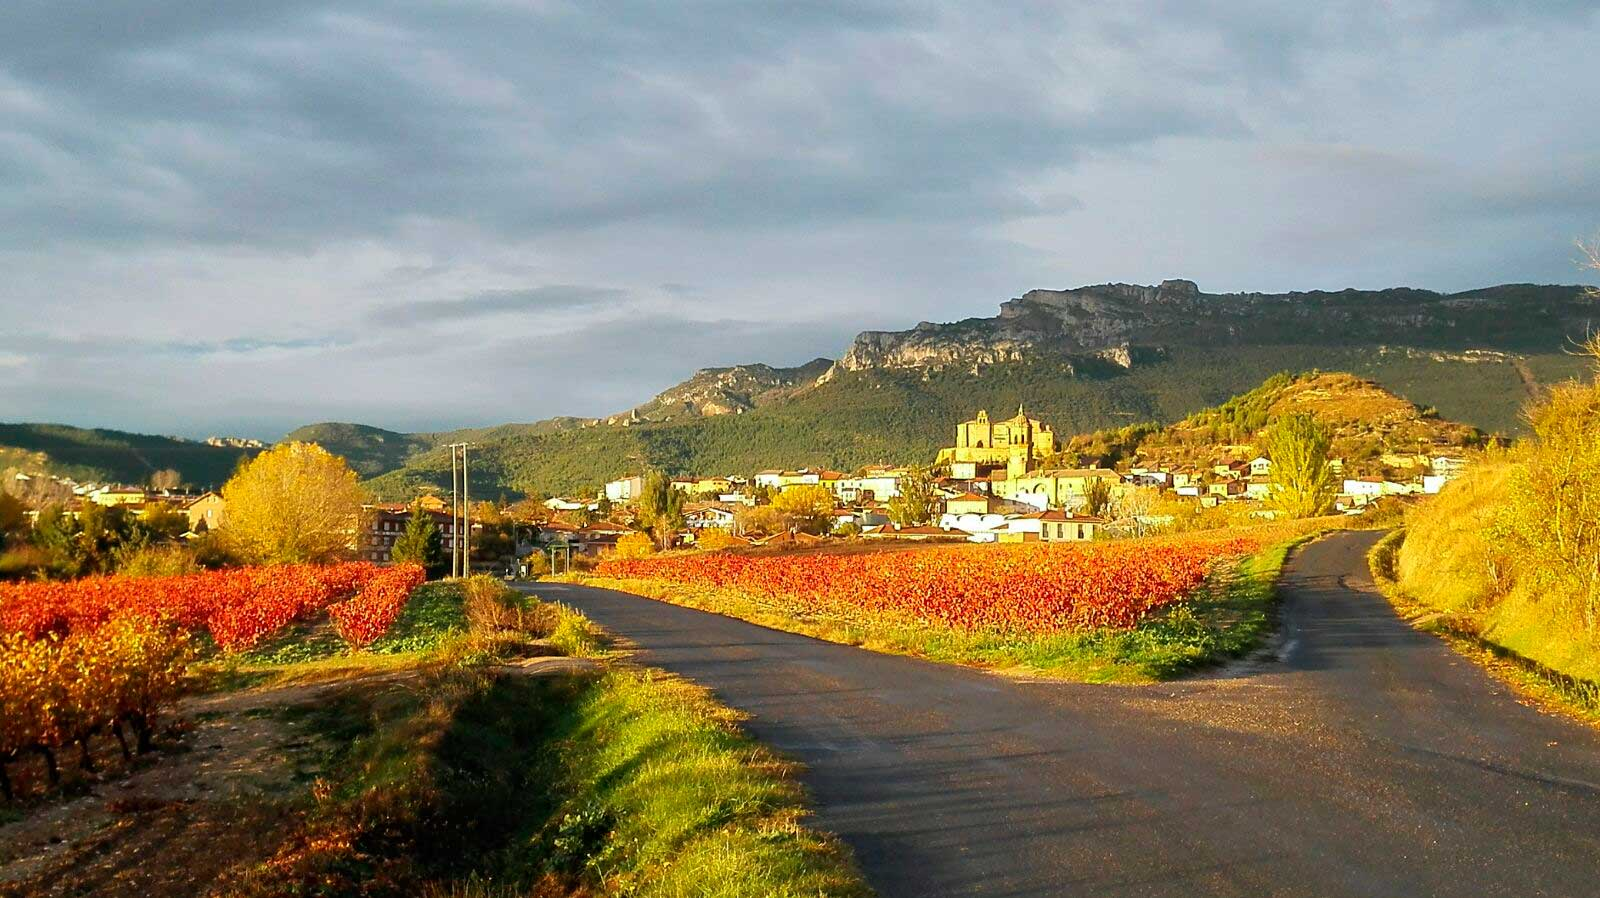 Camino a Labastida